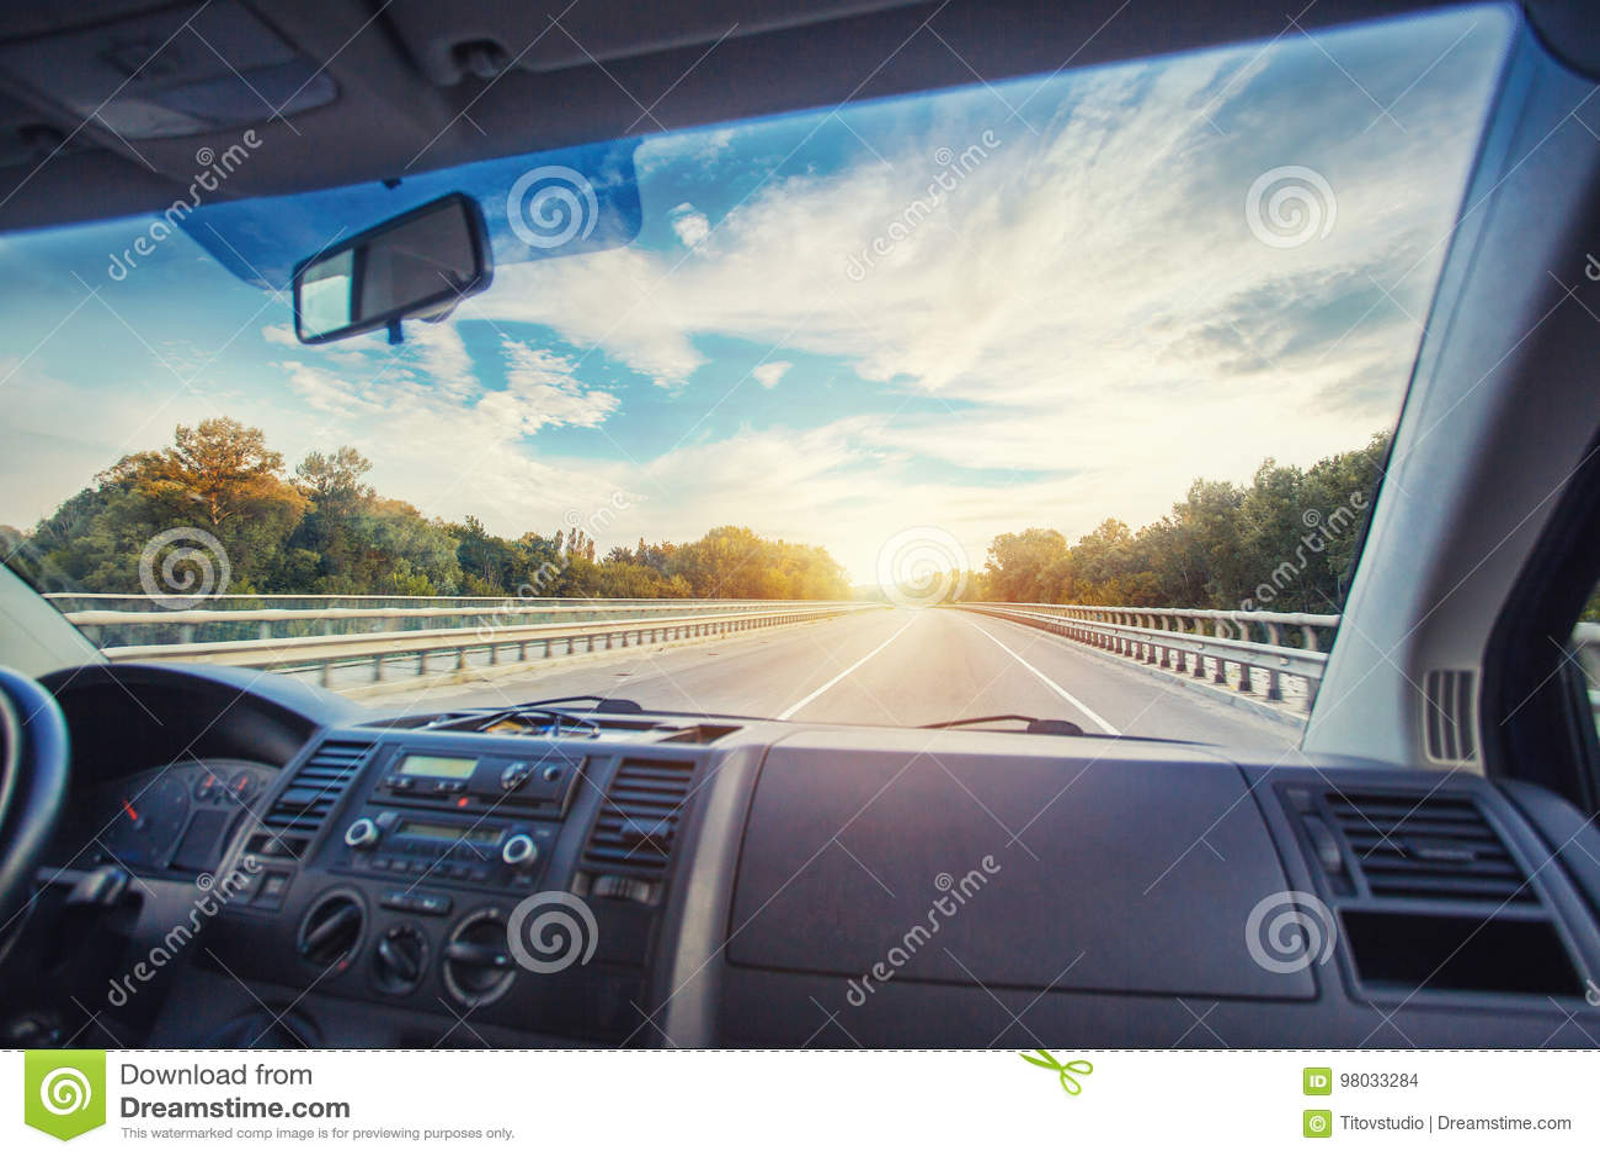 Car dashboard and steering wheel inside of car